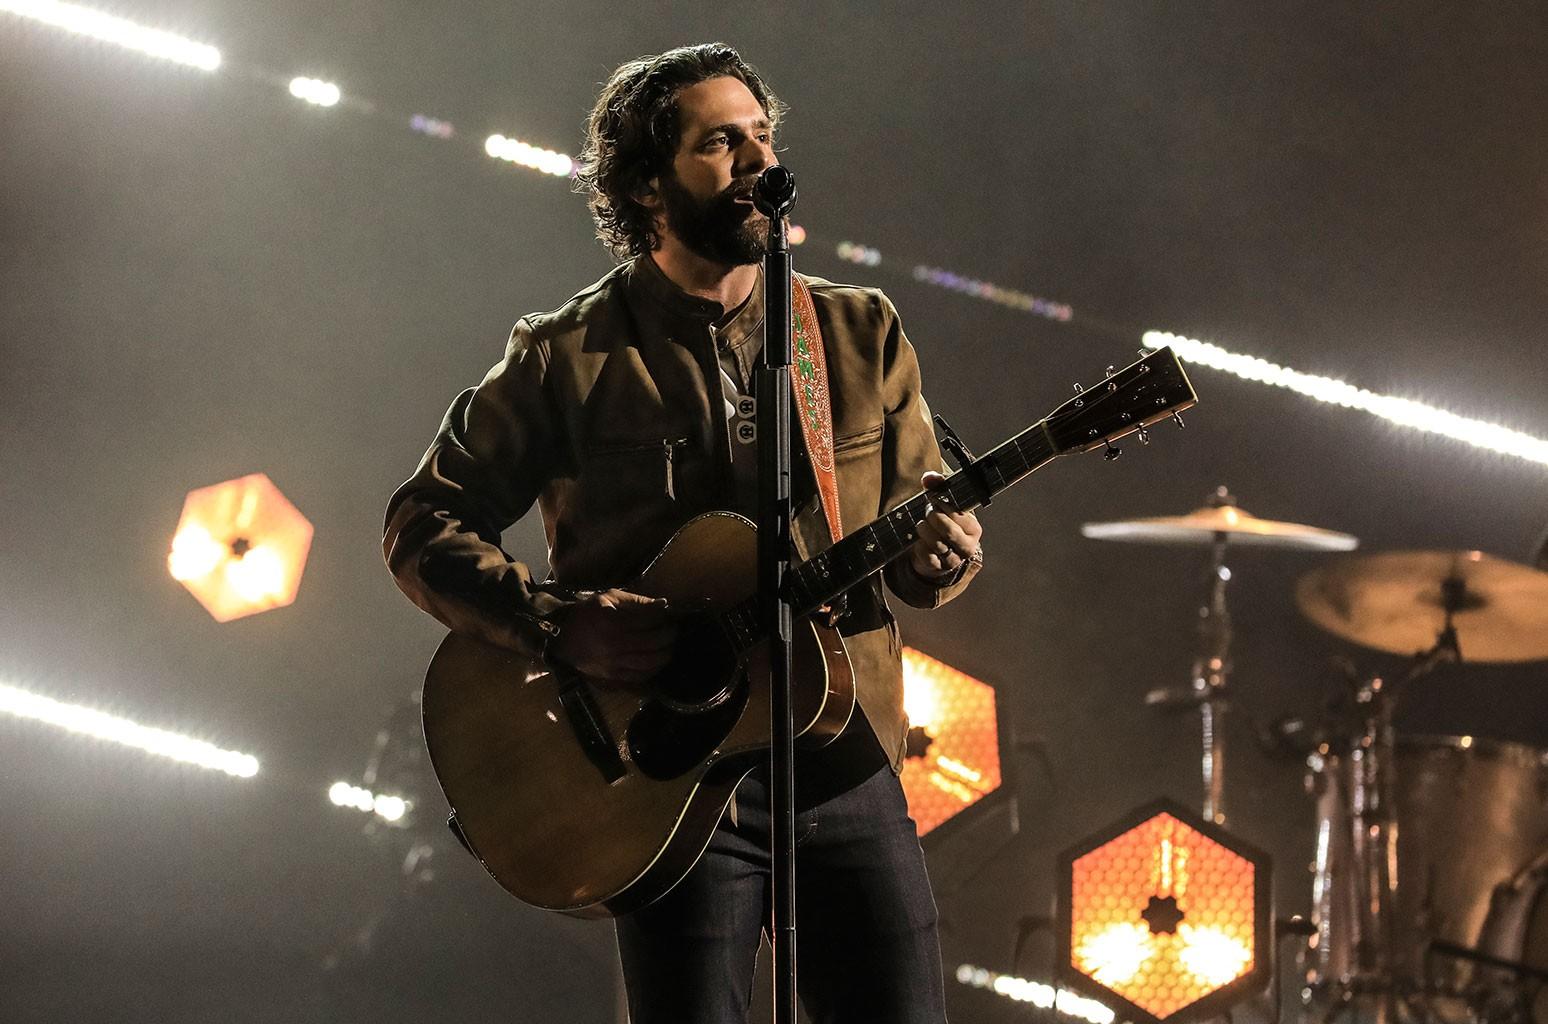 Thomas Rhett Brings a Pair of 'Country' Songs to the 2021 ACM Awards